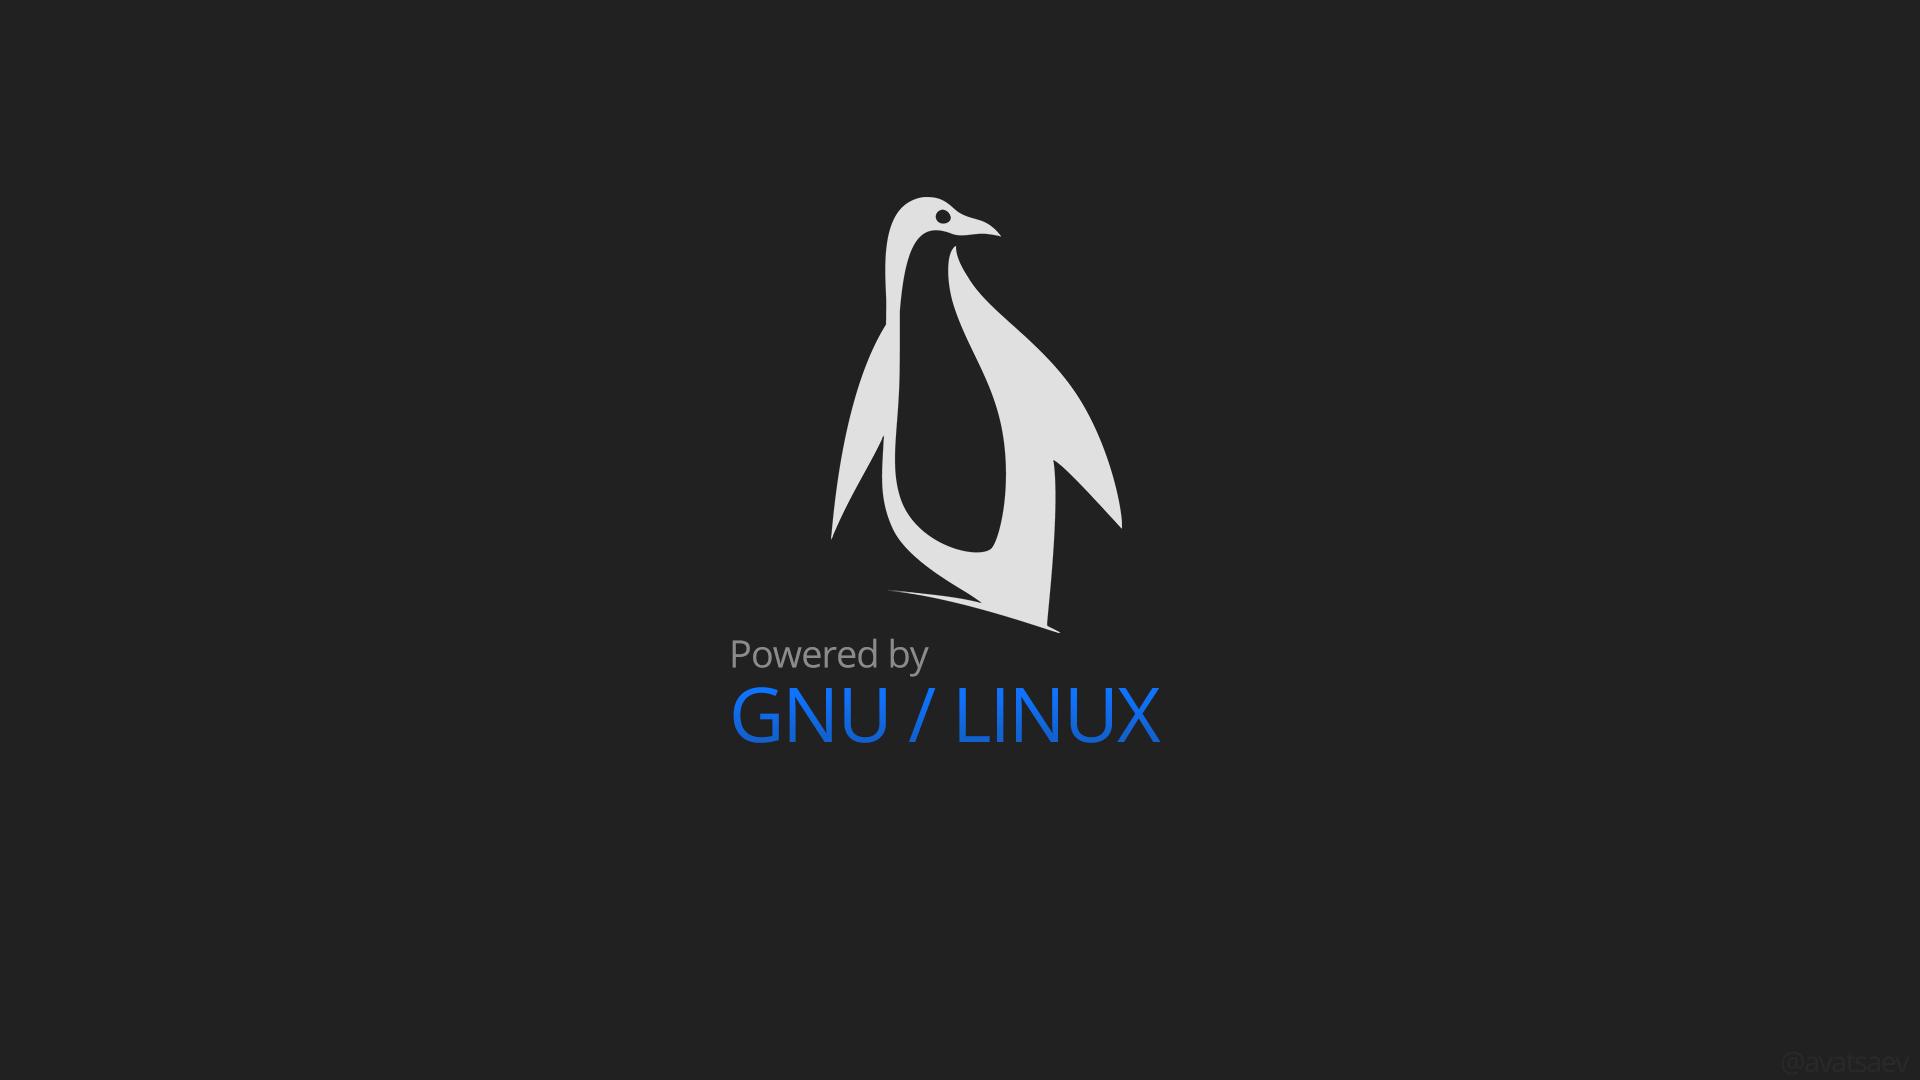 Linux Wallpaper Hd Desktop Linux Linux Mint Hd Desktop